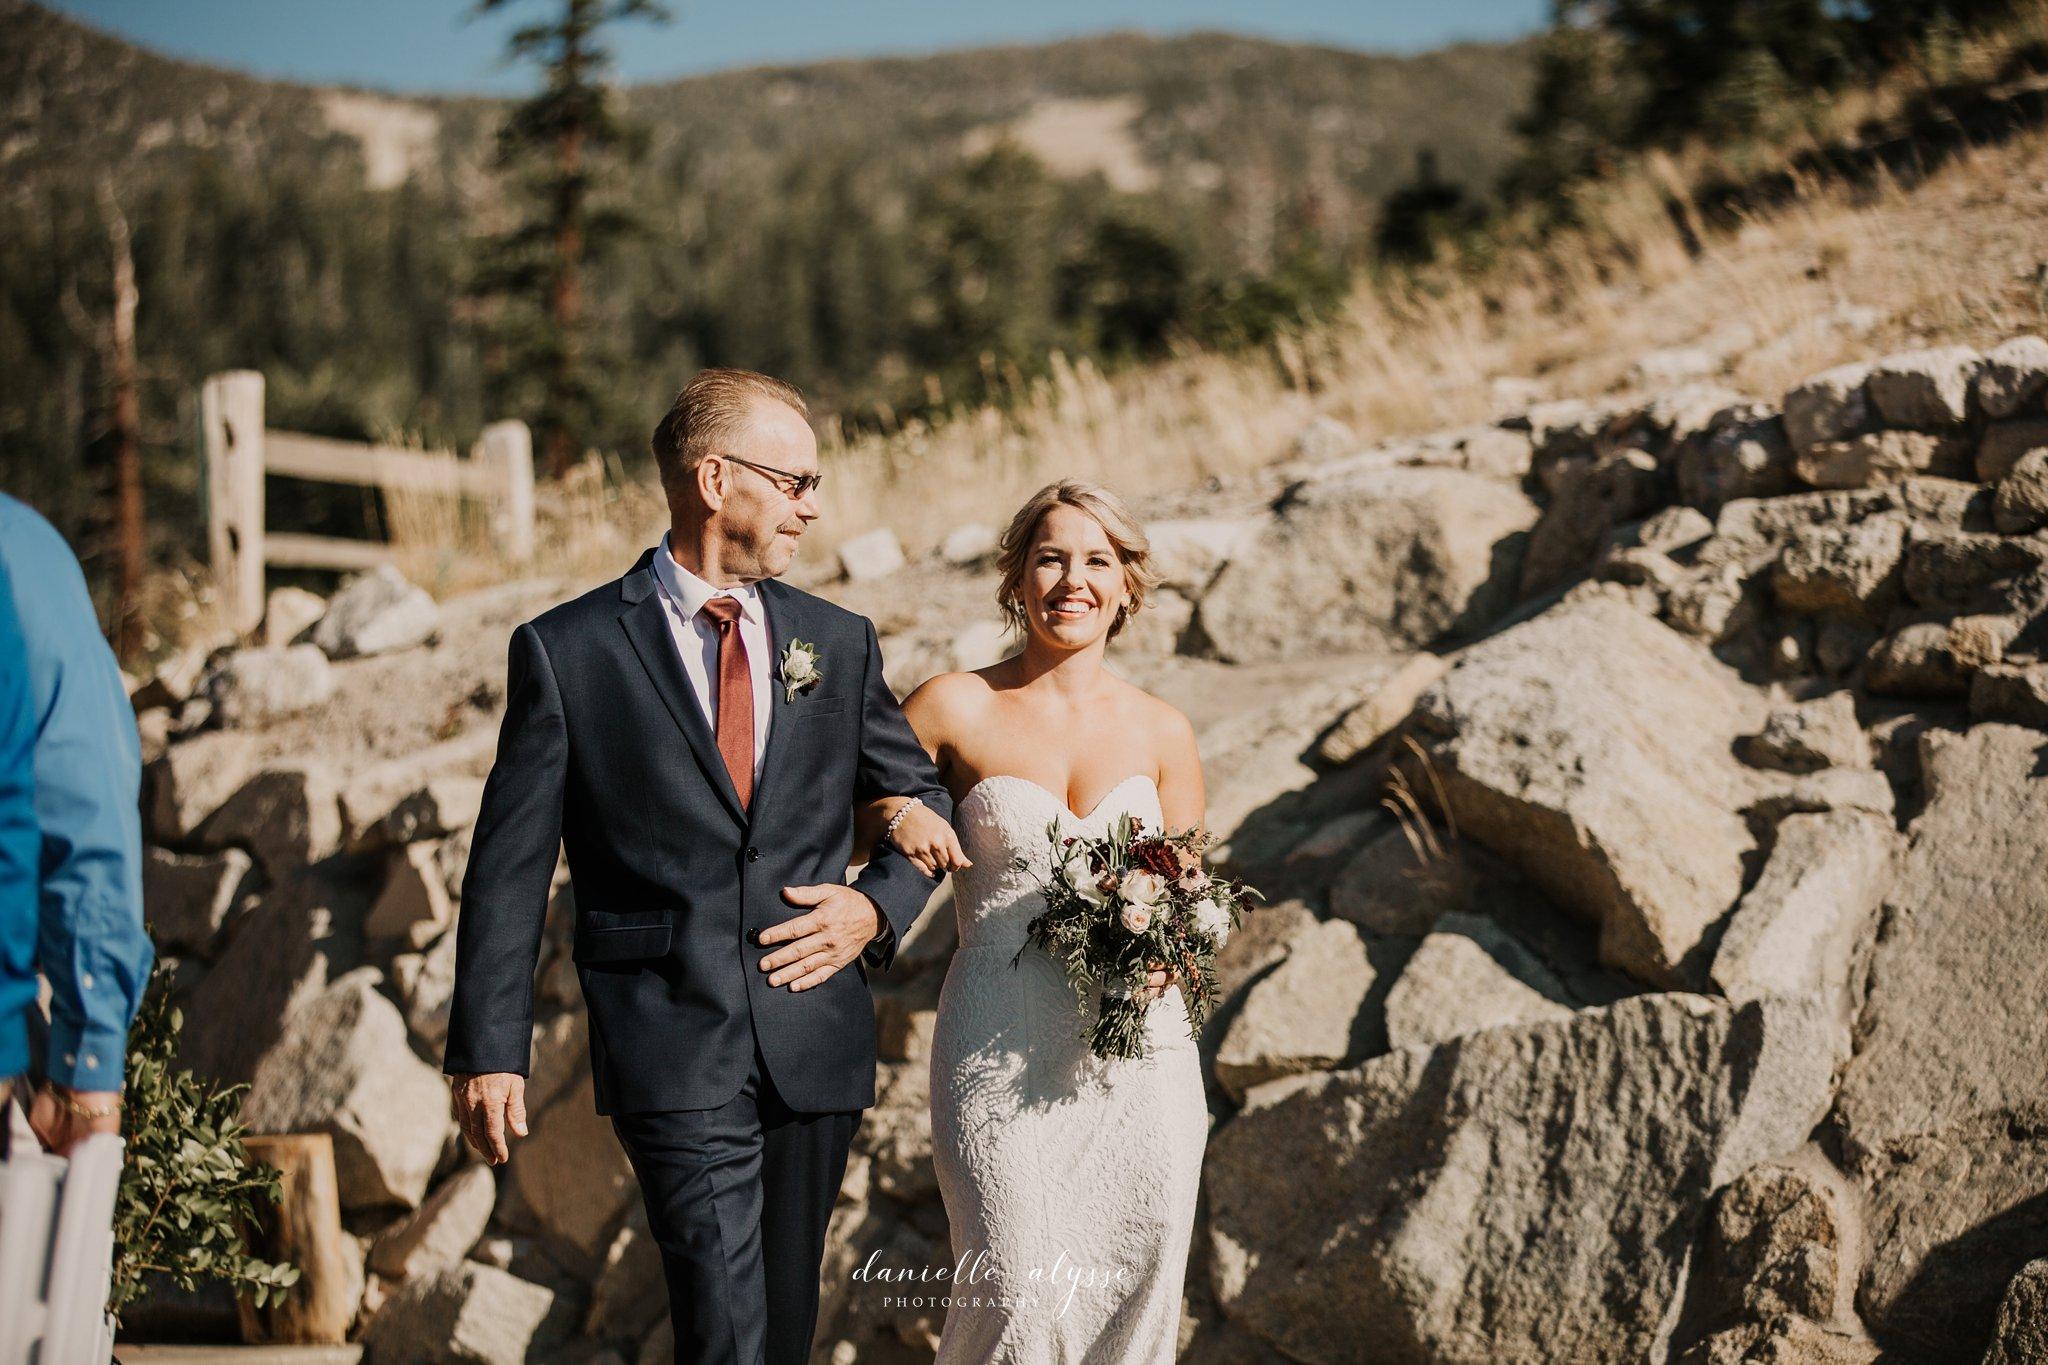 180831_wedding_stephanie_heavenly_south_lake_tahoe_danielle_alysse_photography_destination_blog_633_WEB.jpg